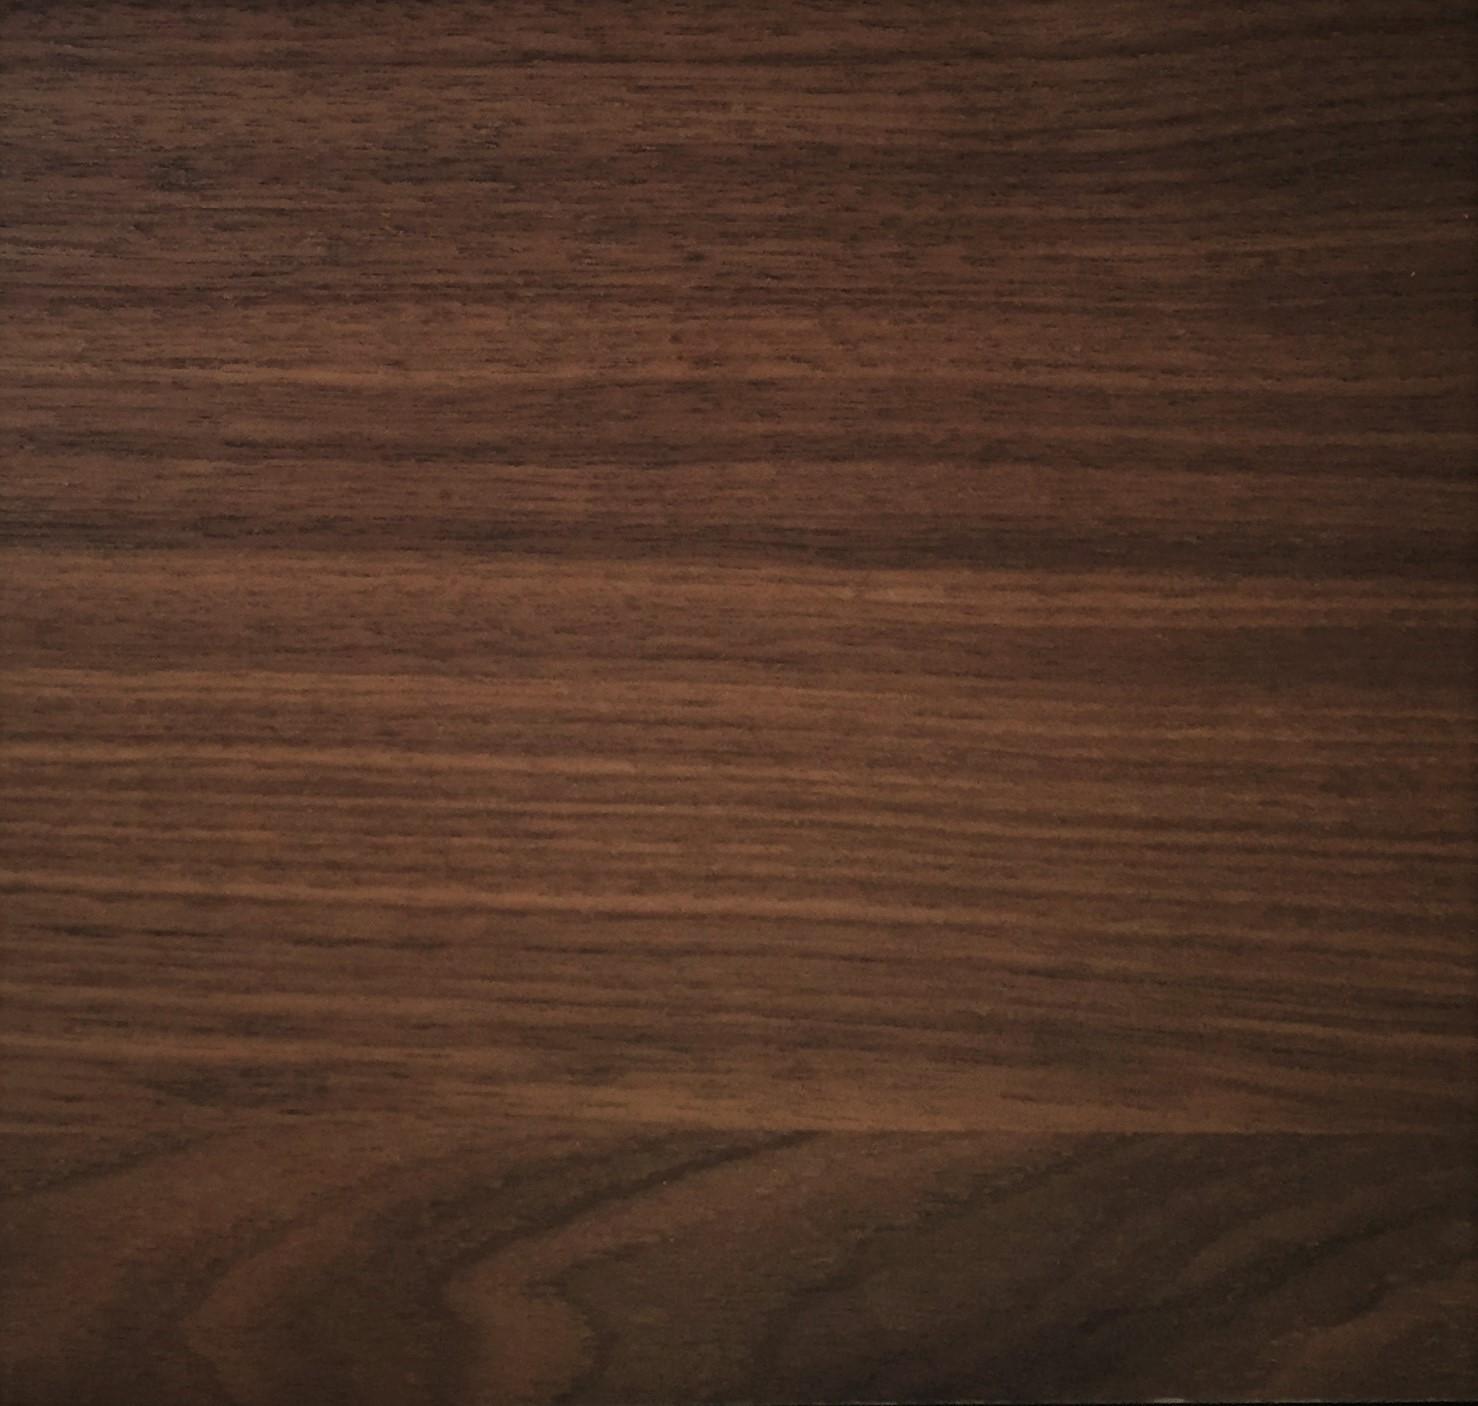 Guardia Iris Modern Bed In Lacquer Wood Veneer